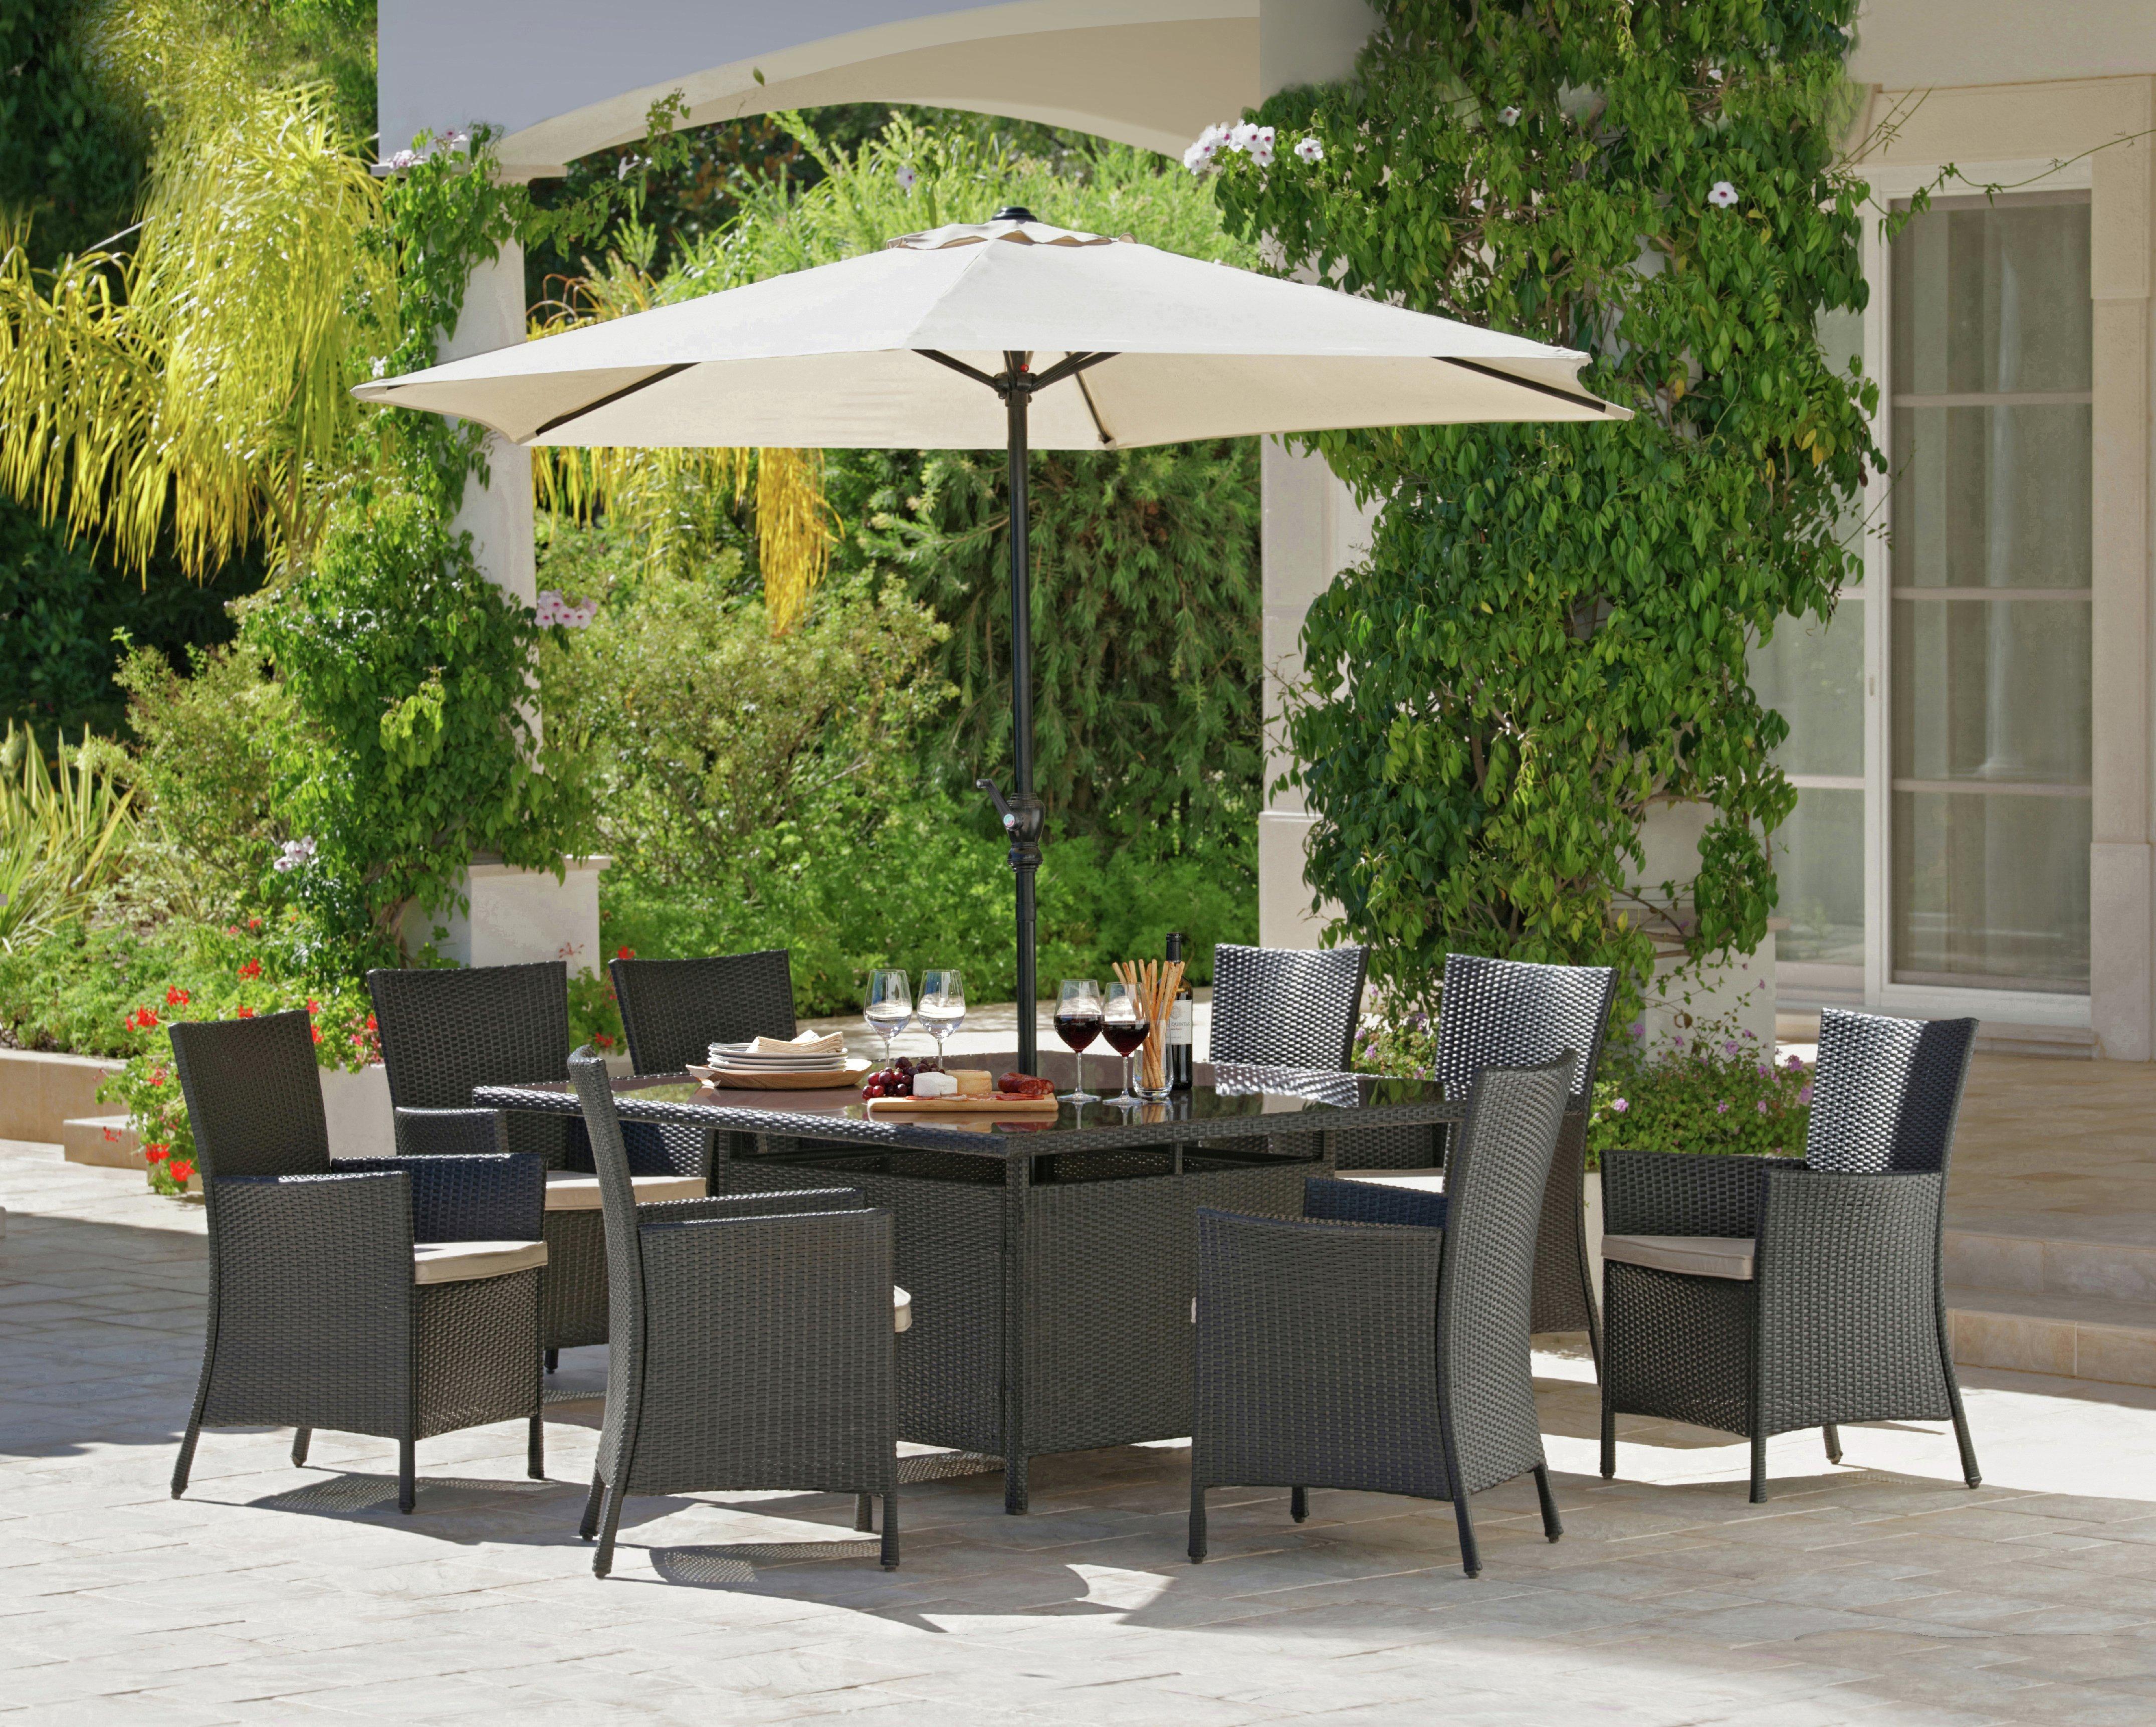 garden dining sets argos. bali rattan effect 8 seater patio furniture set - brown garden dining sets argos o